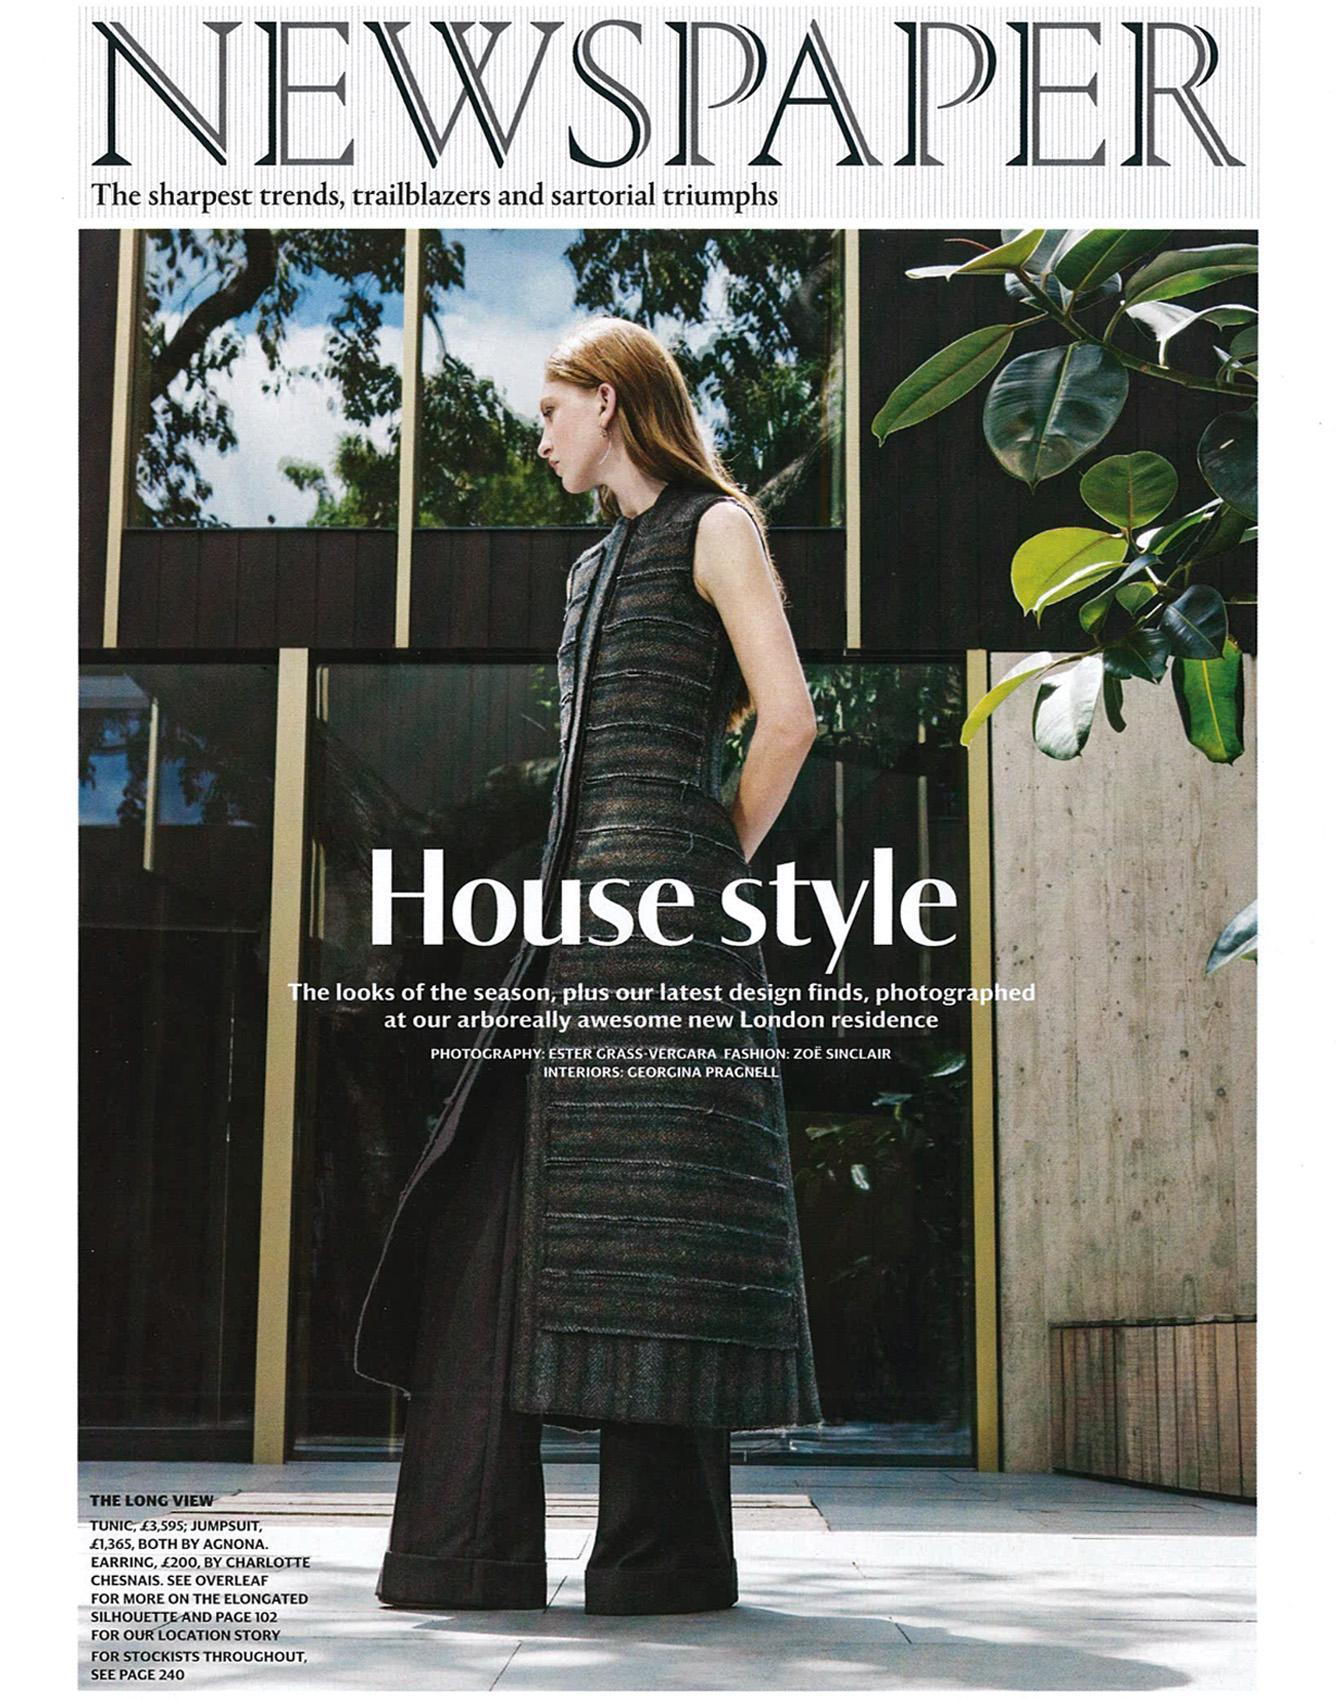 Wallpaper-Pear-Tree-House-Article-Photoshoot-11.jpg